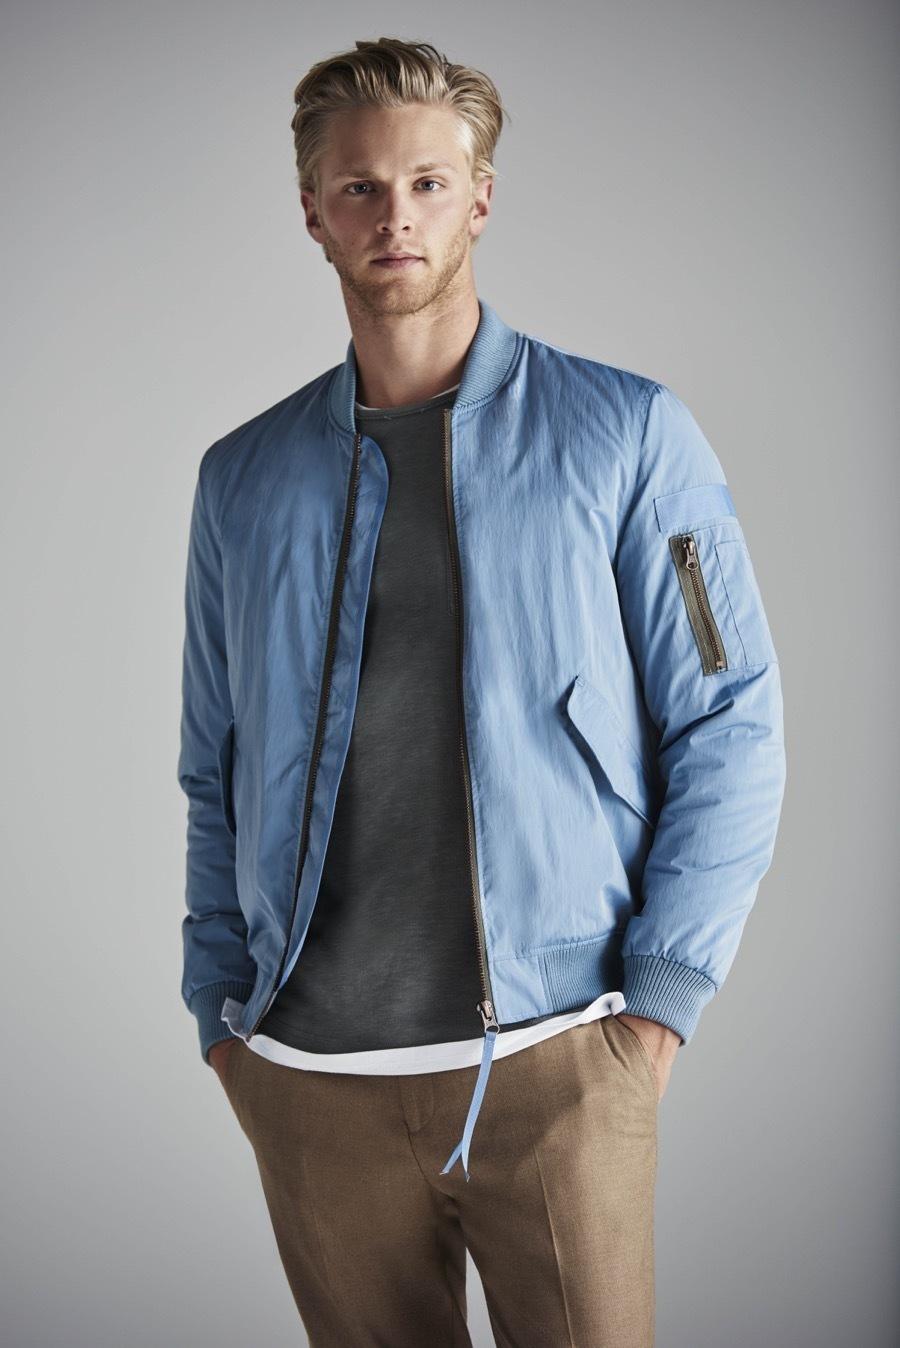 Mens jacket light blue - Reach For A Light Blue Bomber Jacket And Camel Dress Pants Like A True Gent